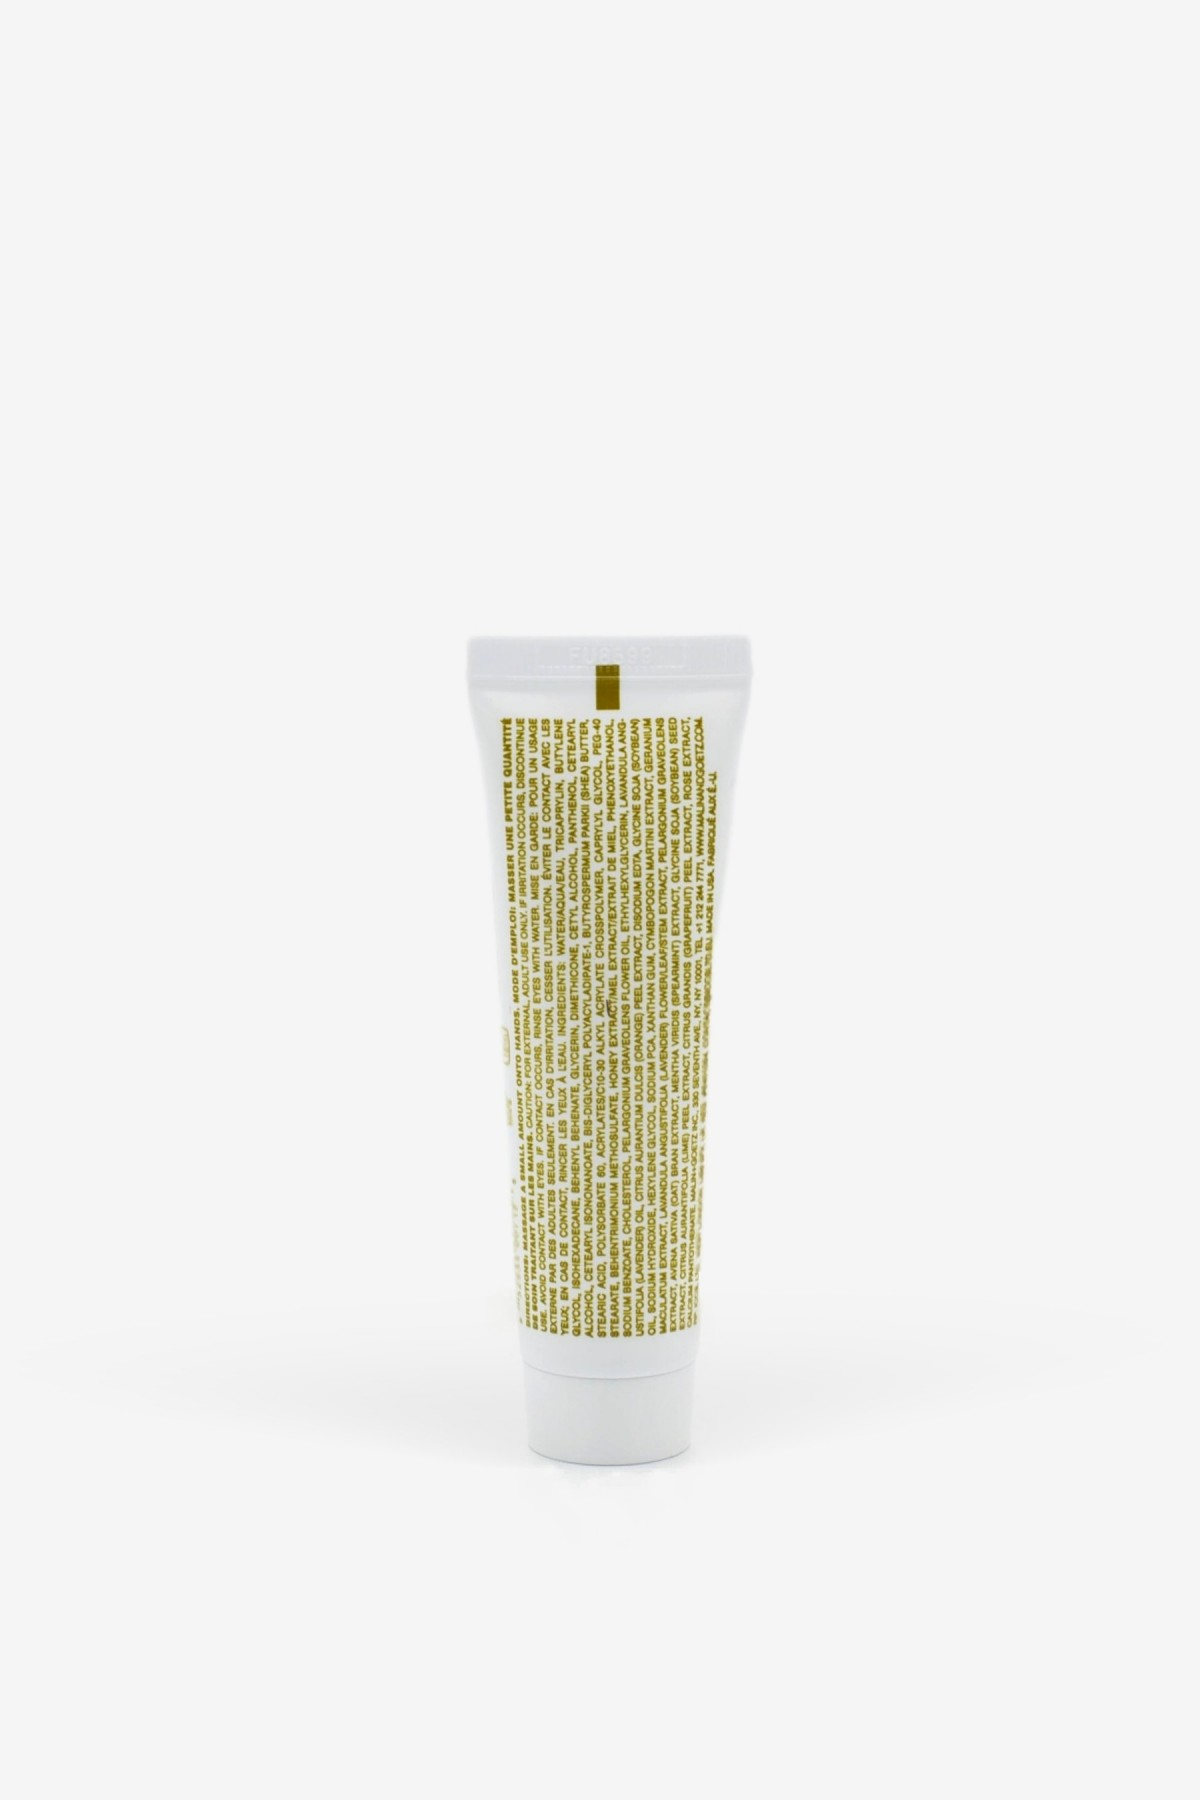 Malin+Goetz Geranium Hand Treatment 30ml in